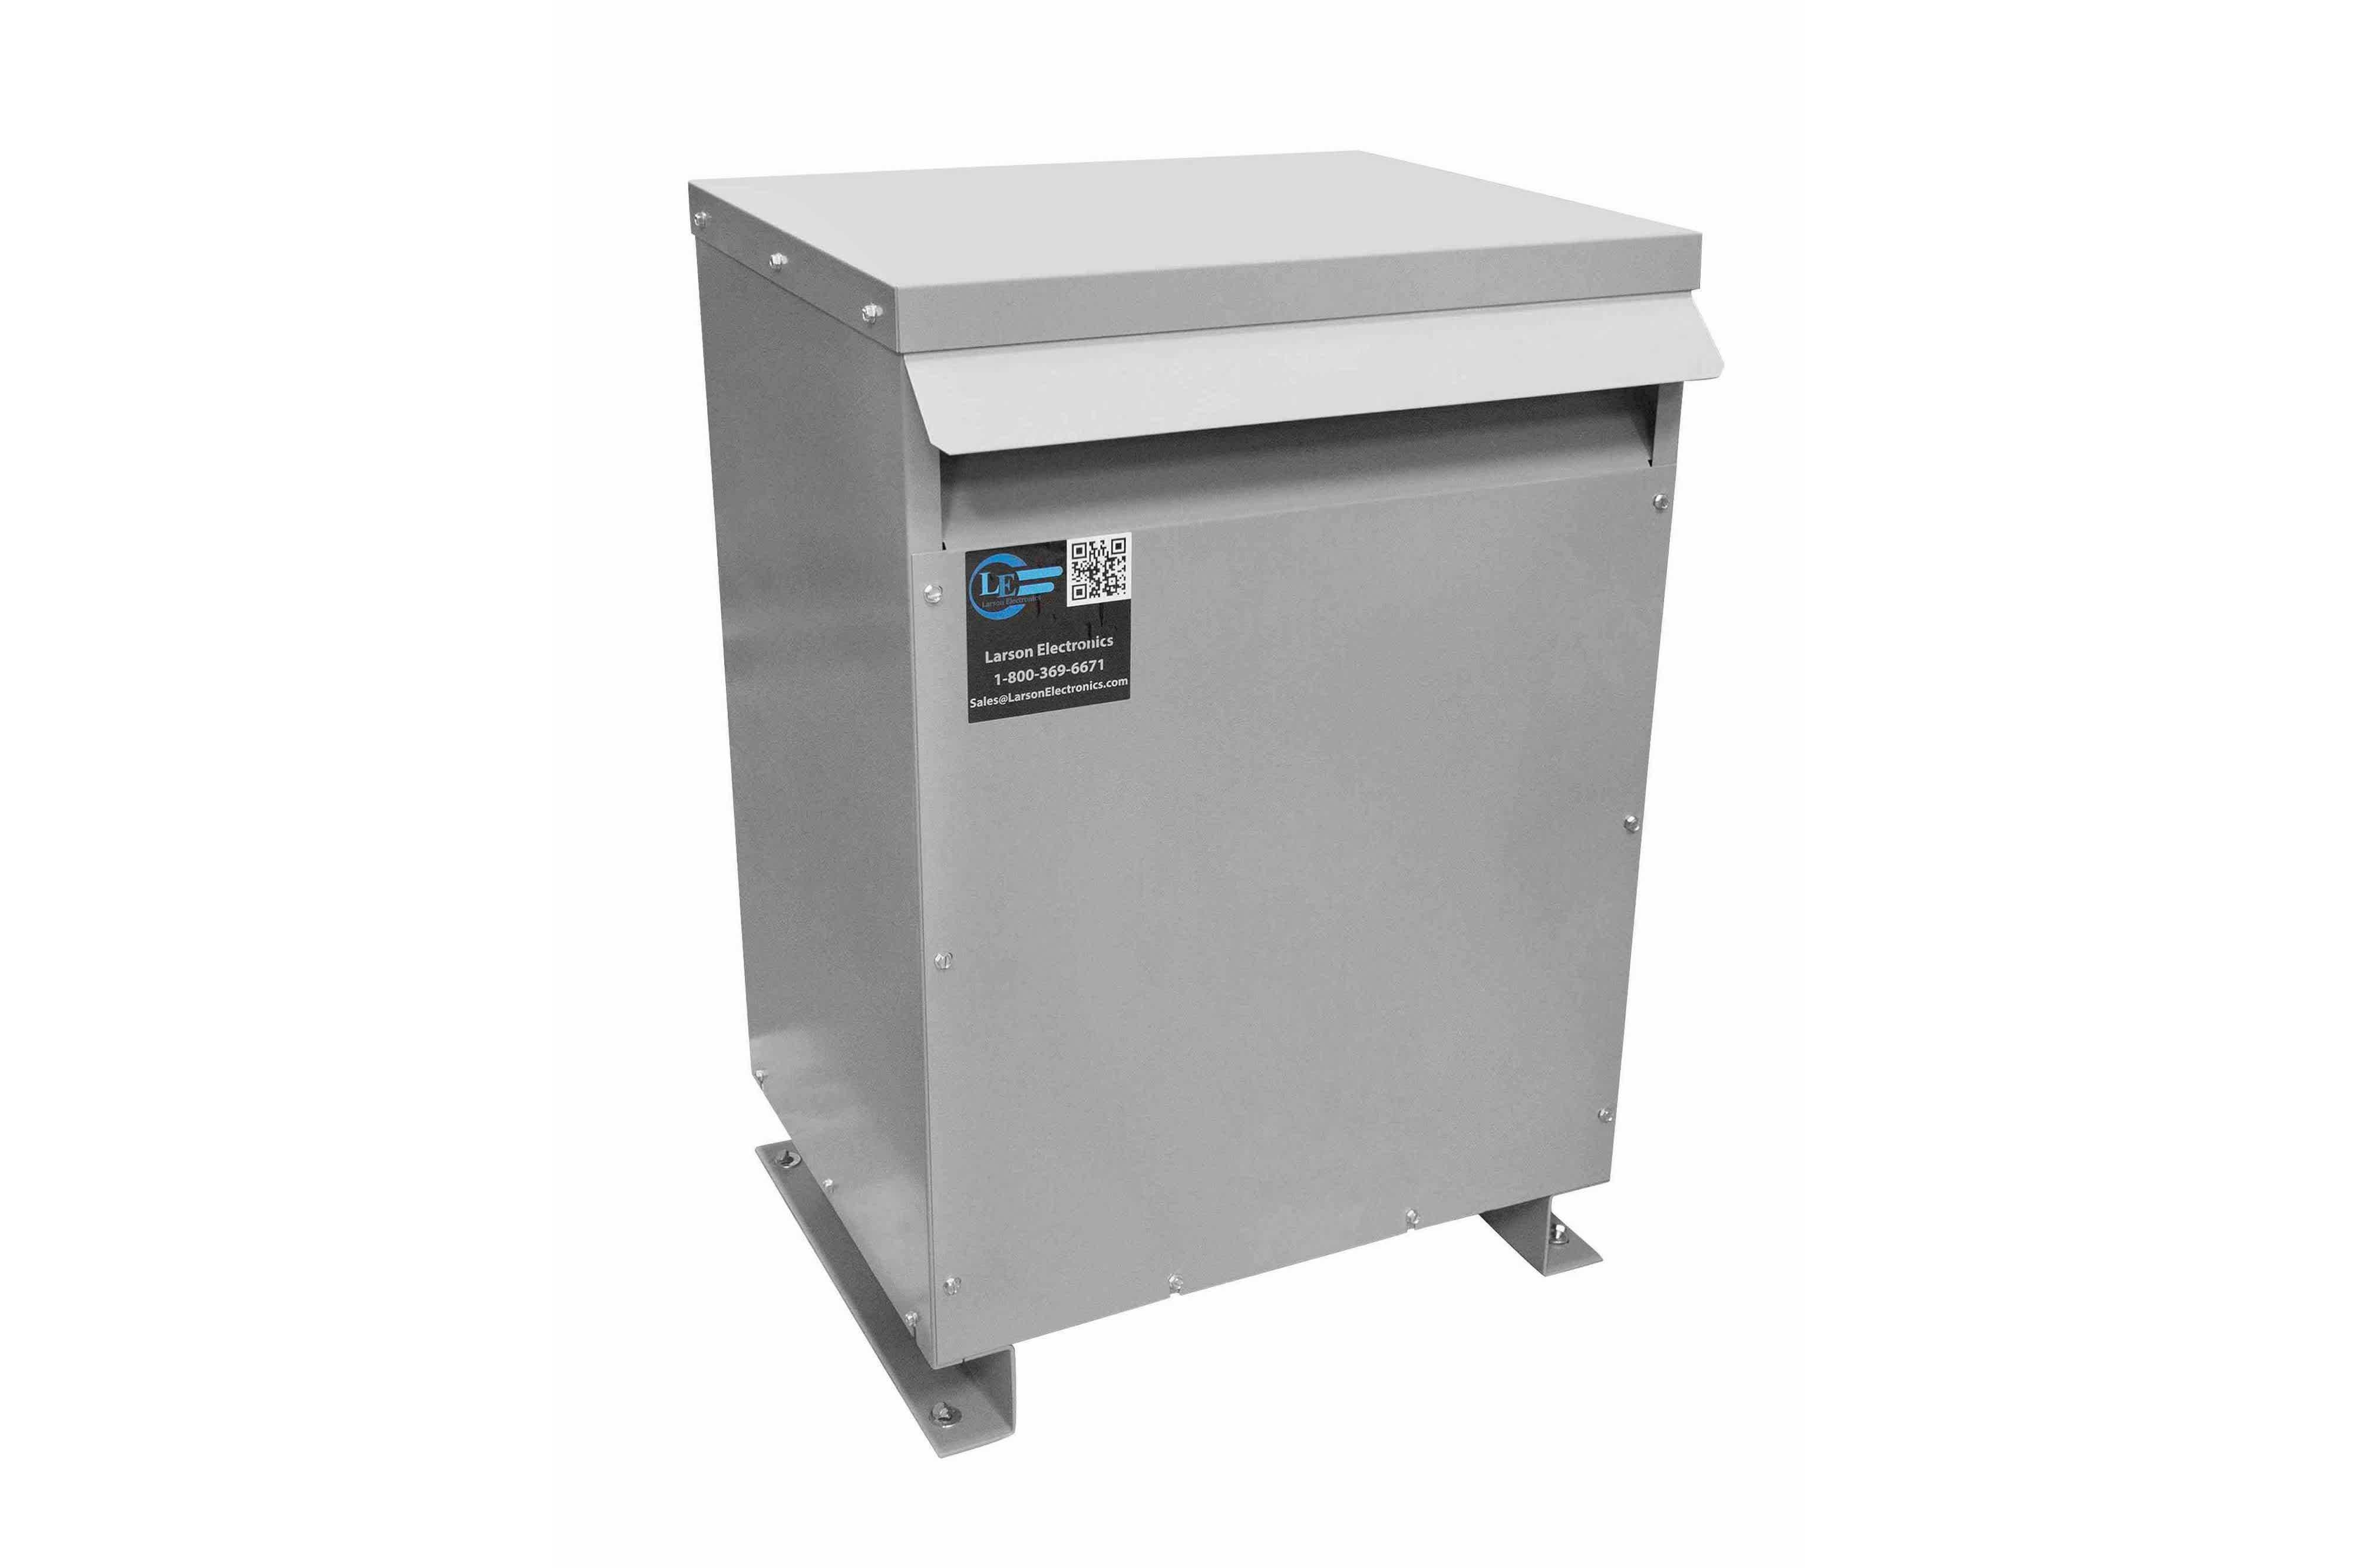 300 kVA 3PH DOE Transformer, 230V Delta Primary, 480Y/277 Wye-N Secondary, N3R, Ventilated, 60 Hz